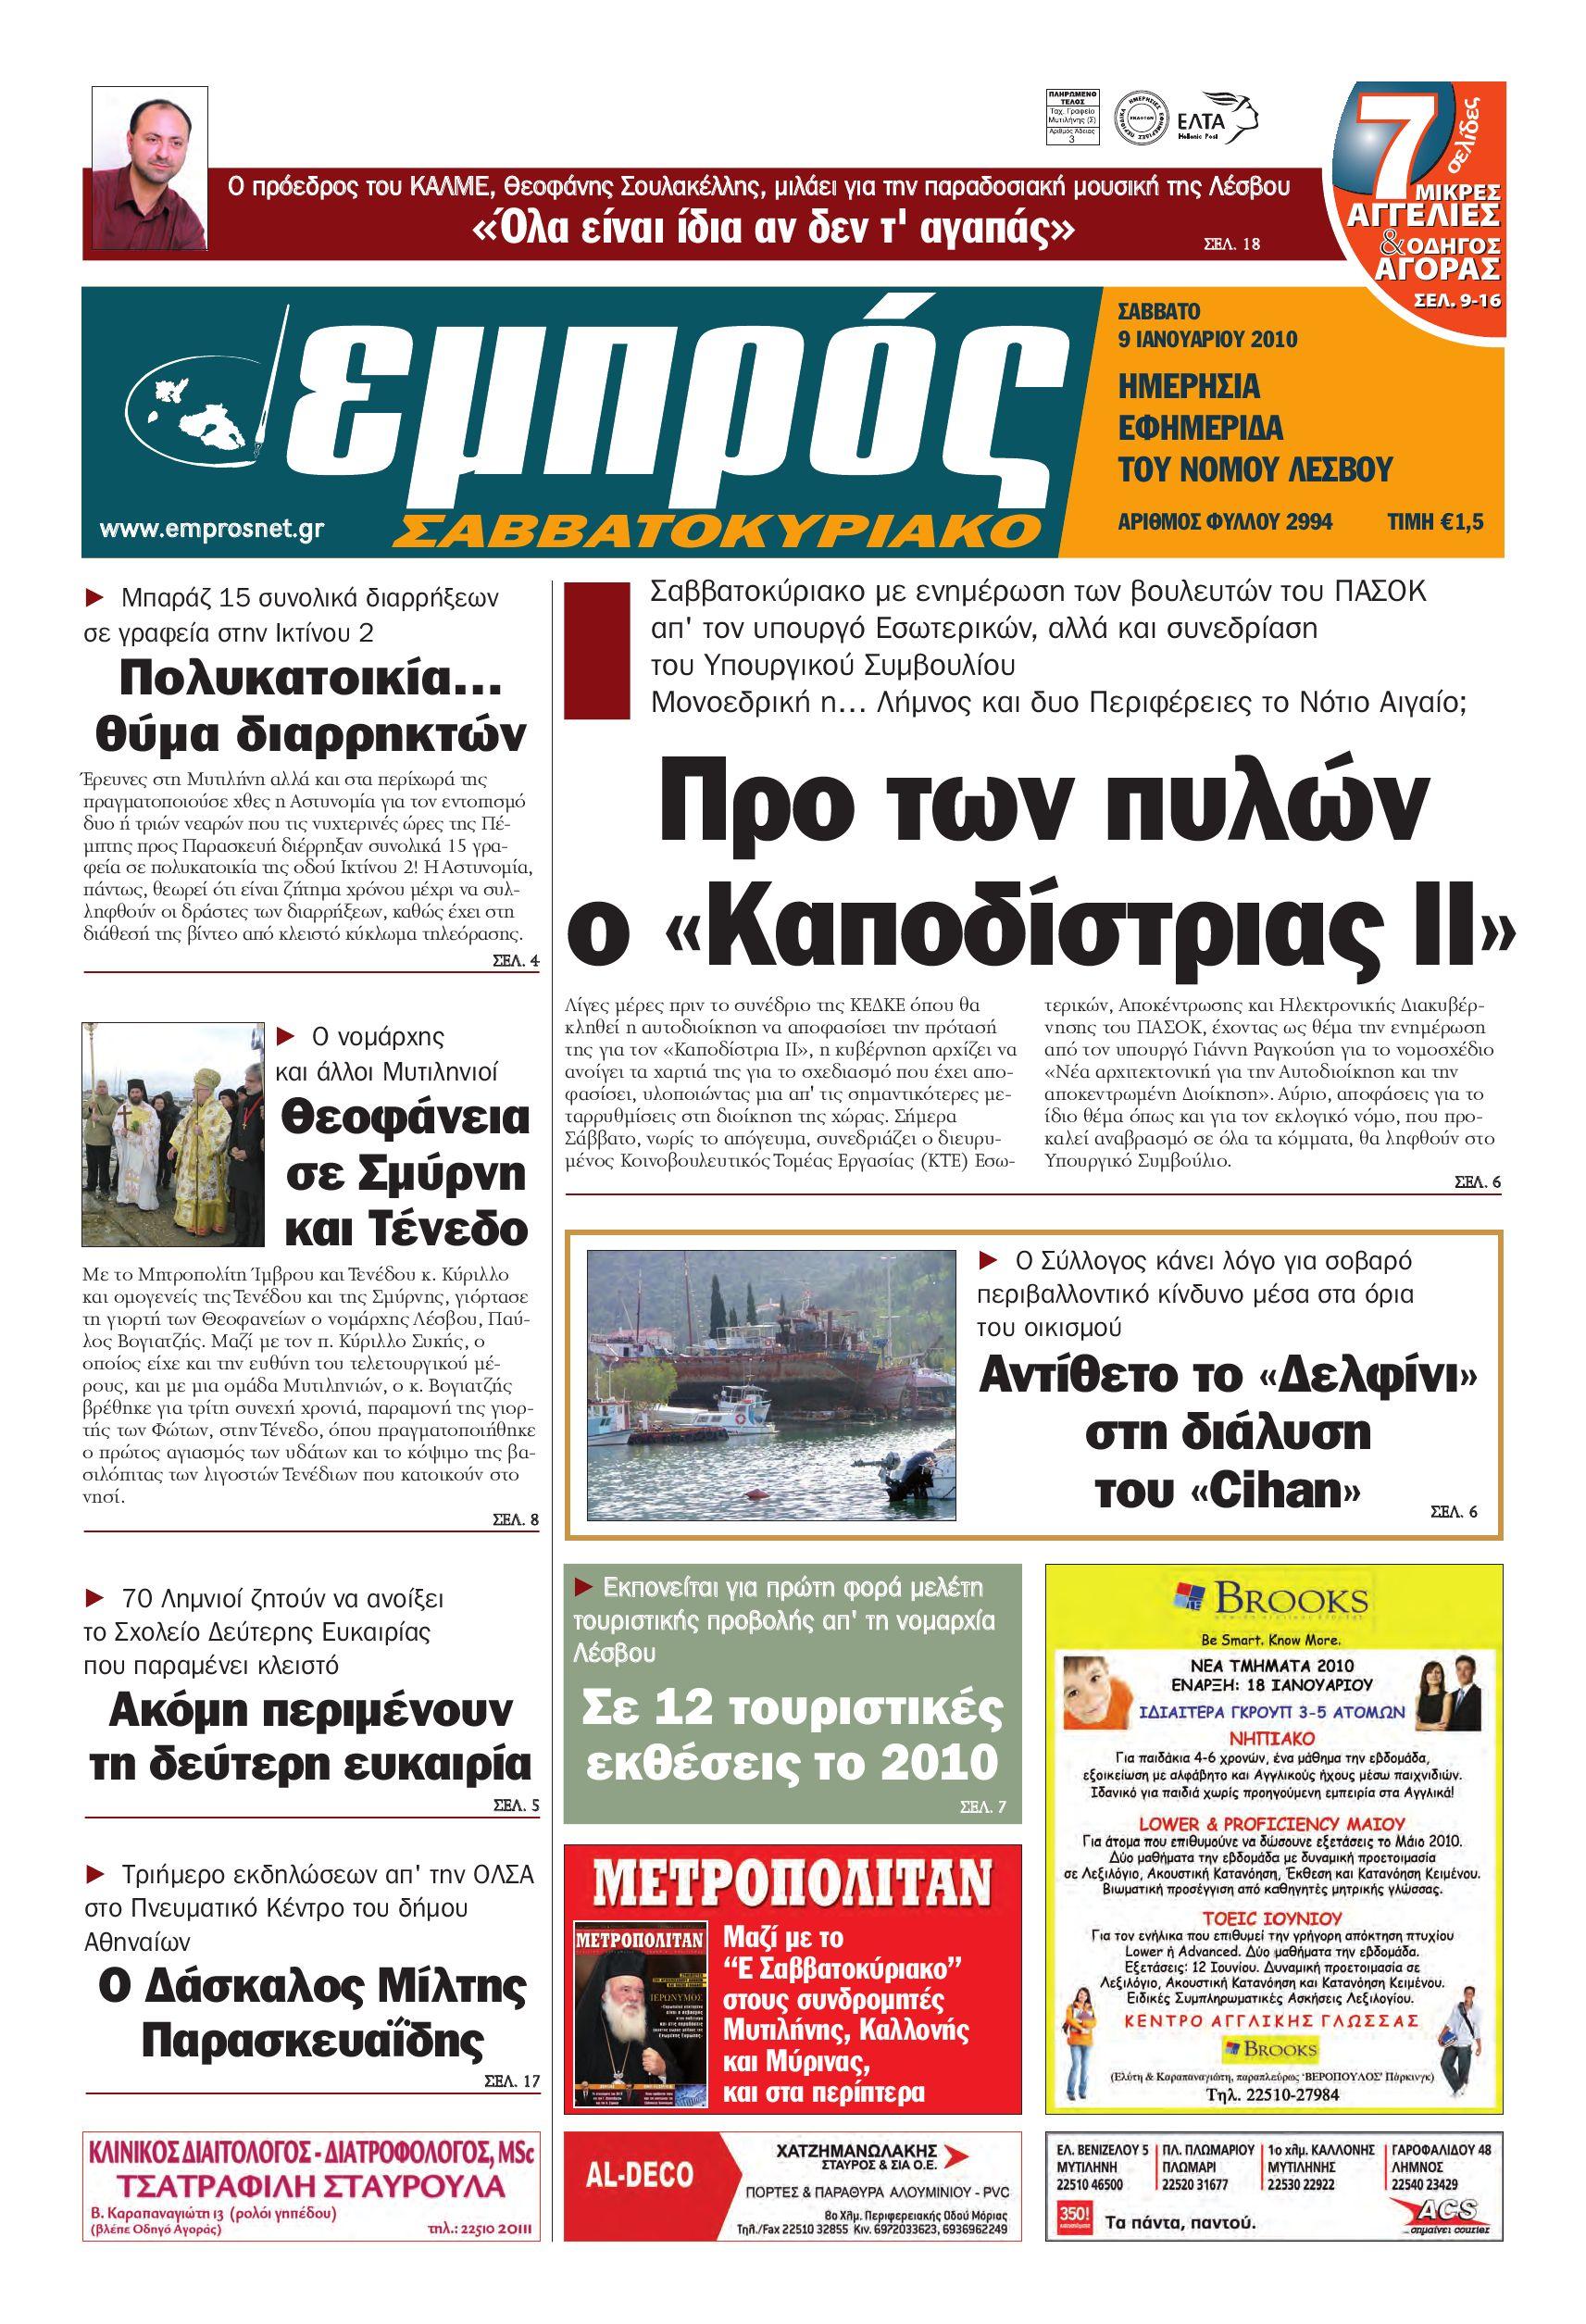 7bd5d7beb Εμπρός 2994 by Επικοινωνία Αιγαίου Α.Ε. - issuu